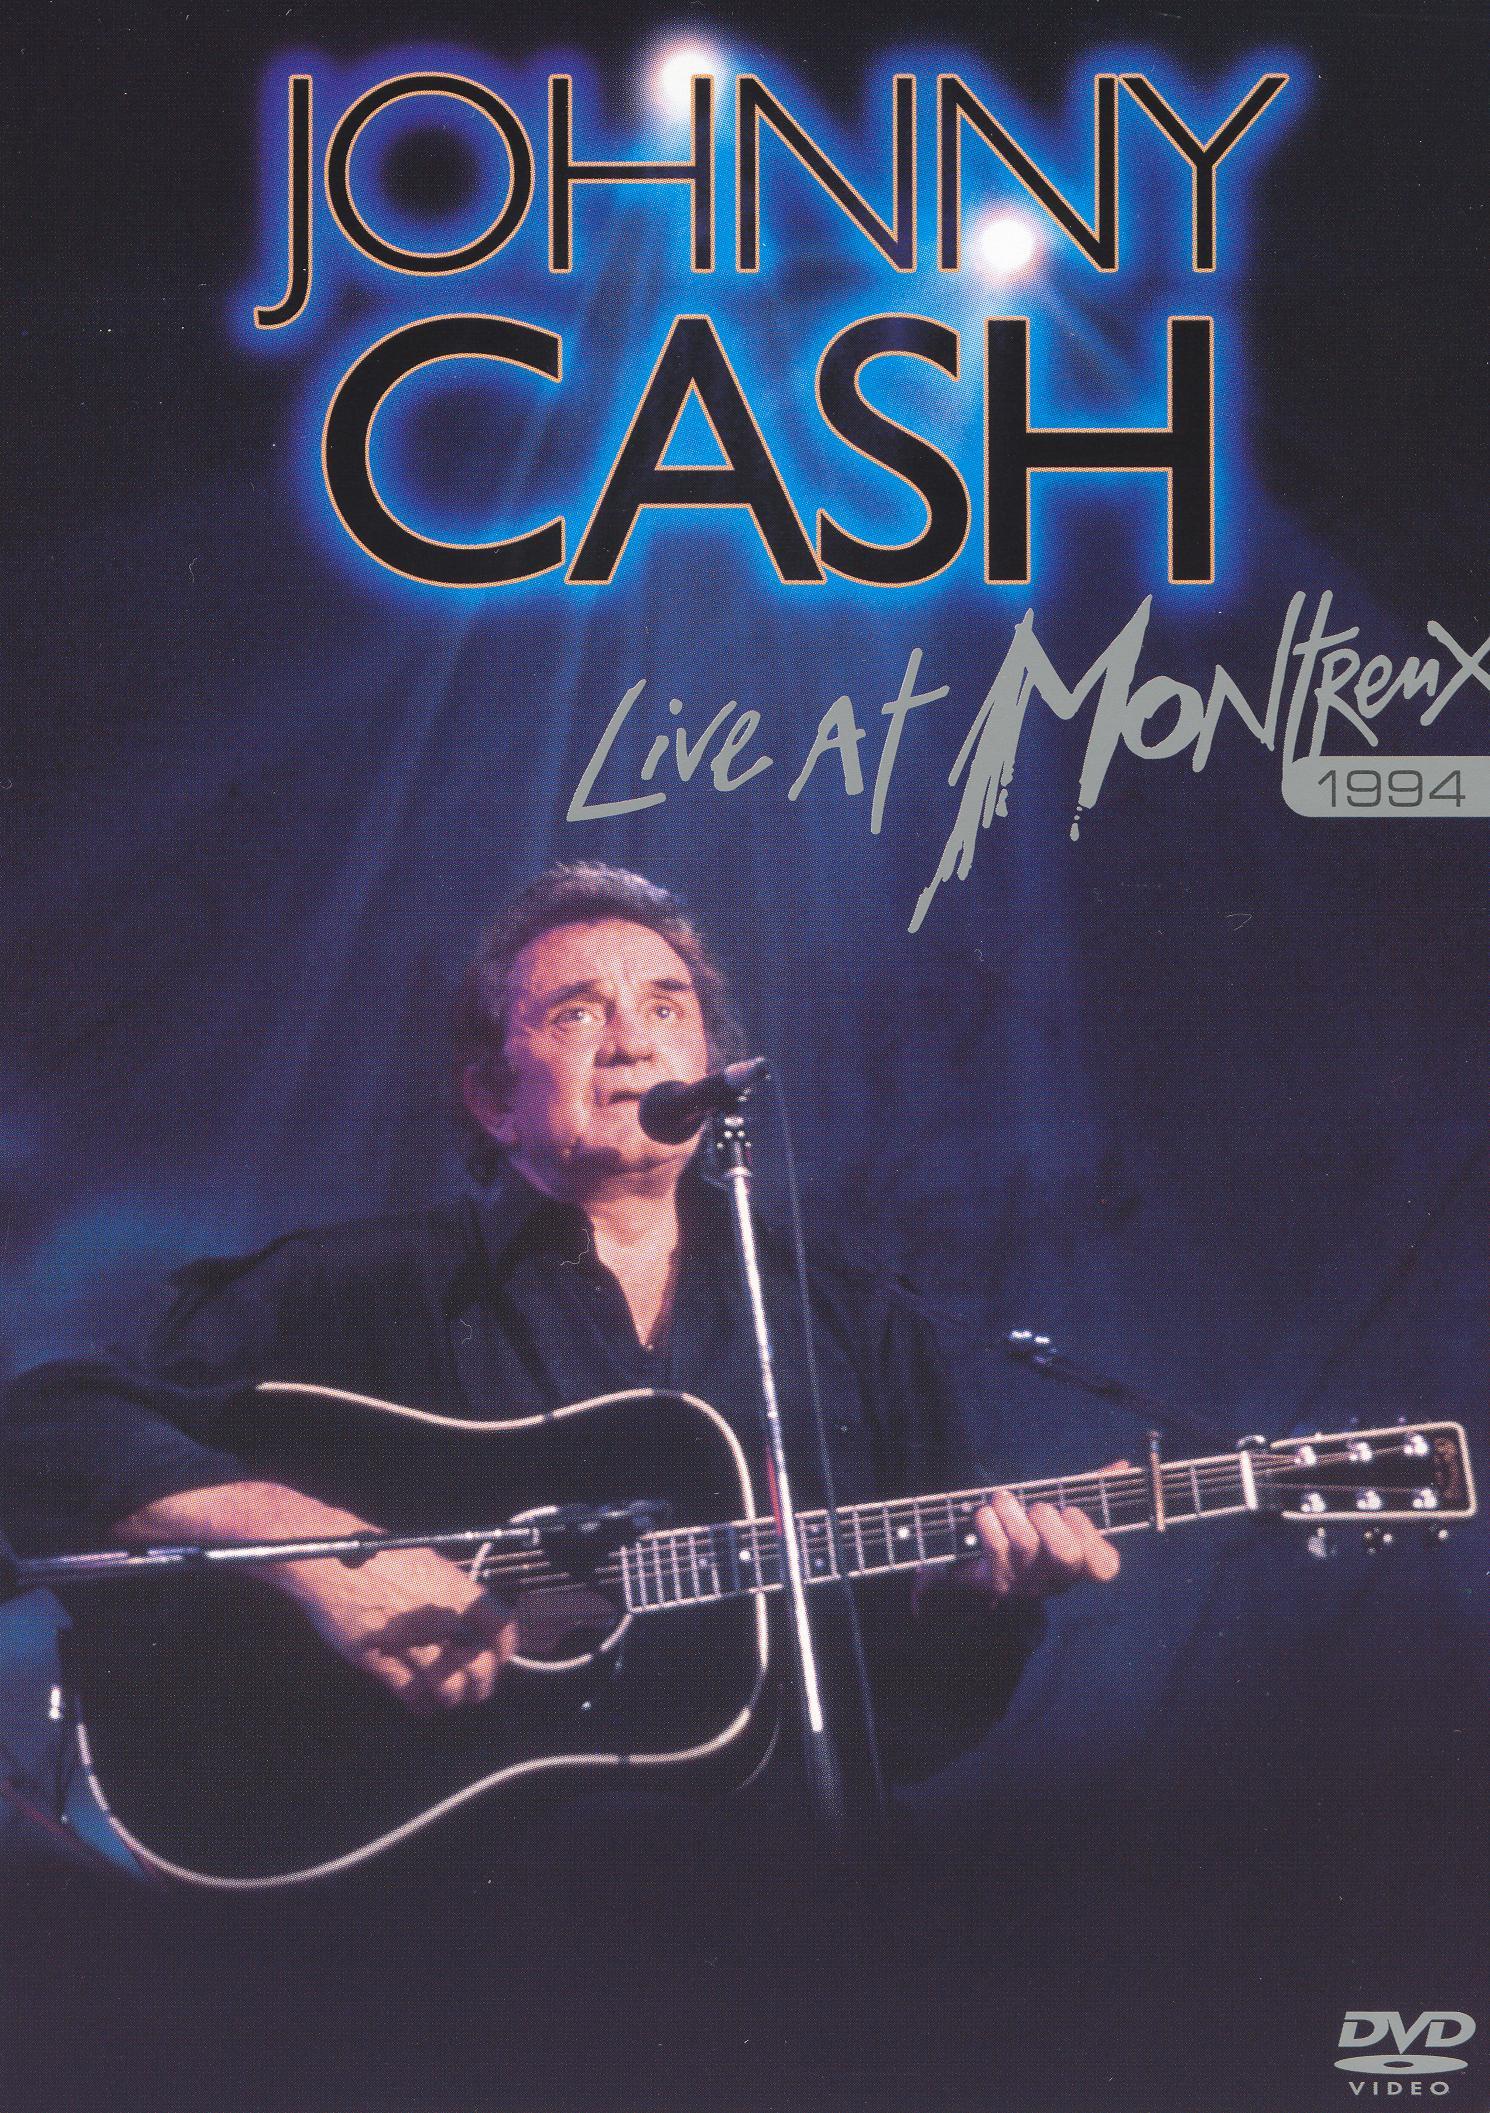 Johnny Cash: Live at Montreux, 1994